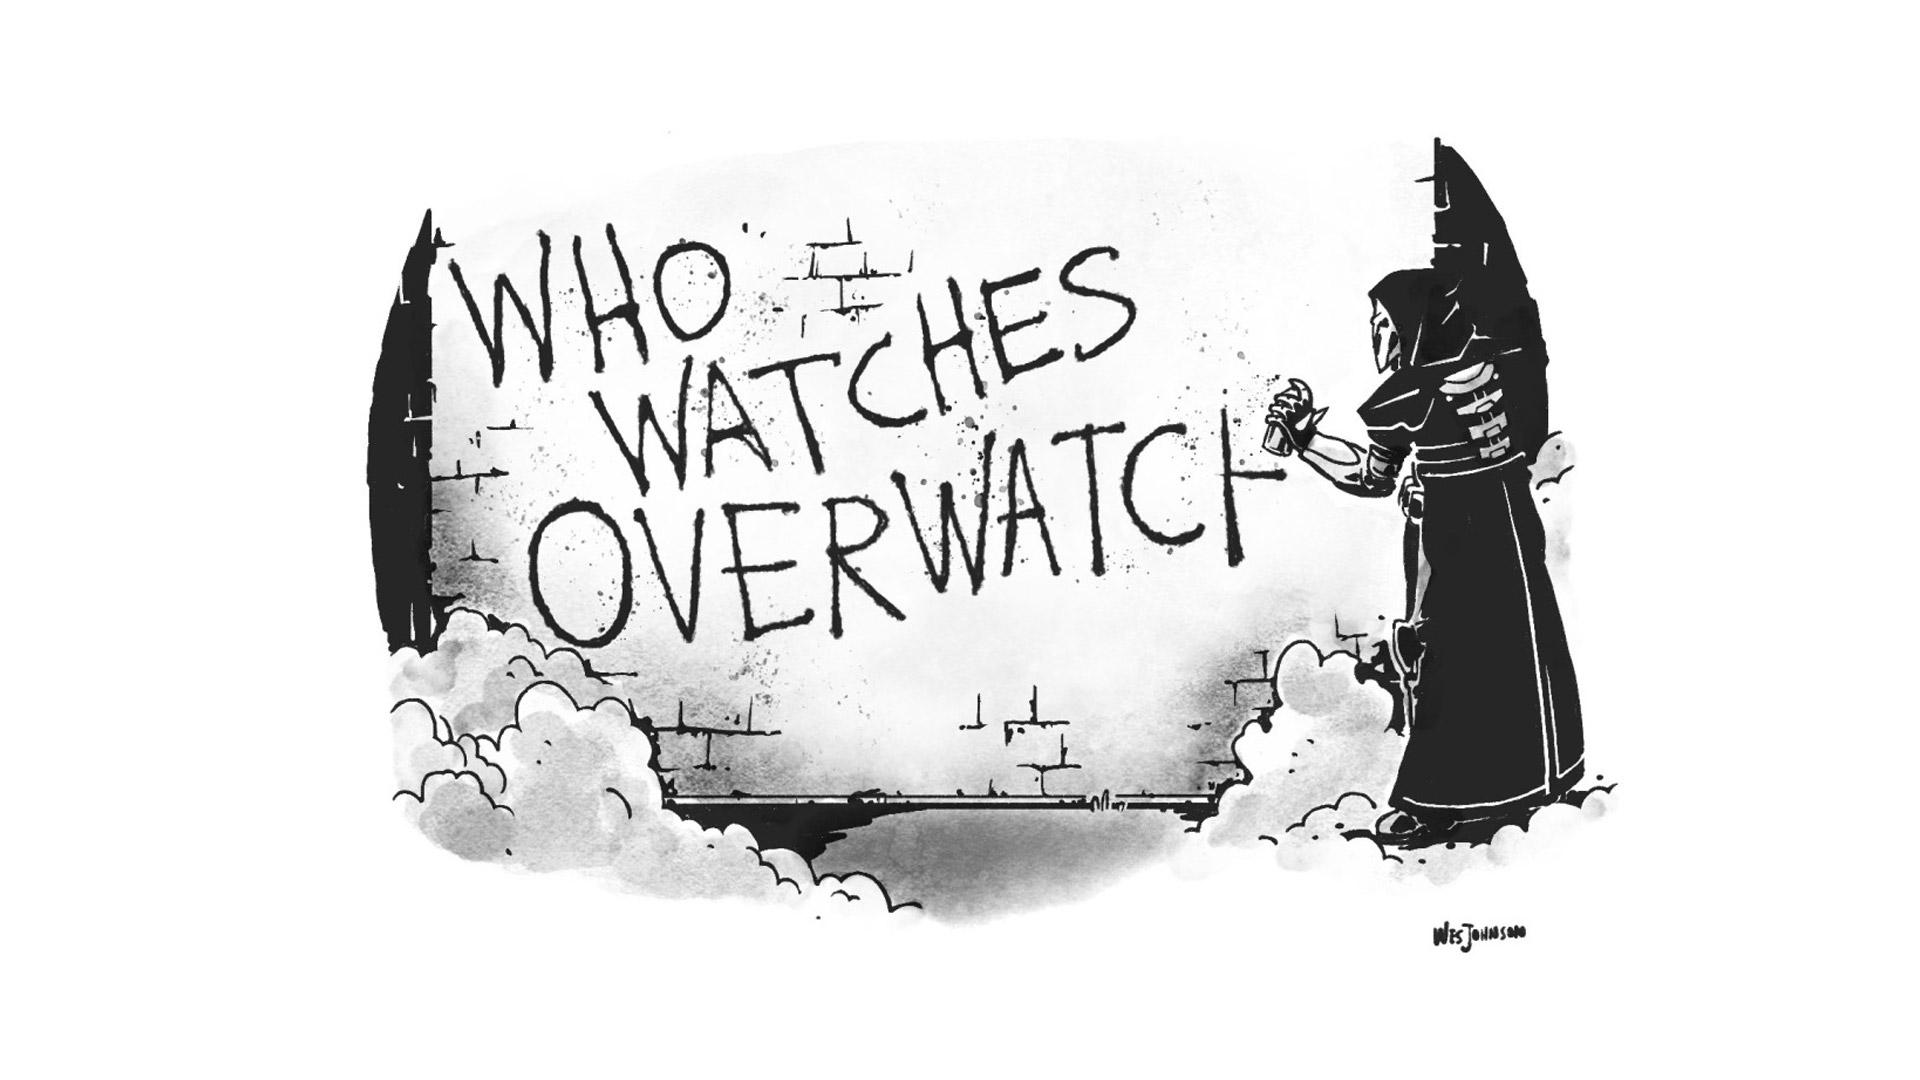 Free Overwatch Wallpaper in 1920x1080